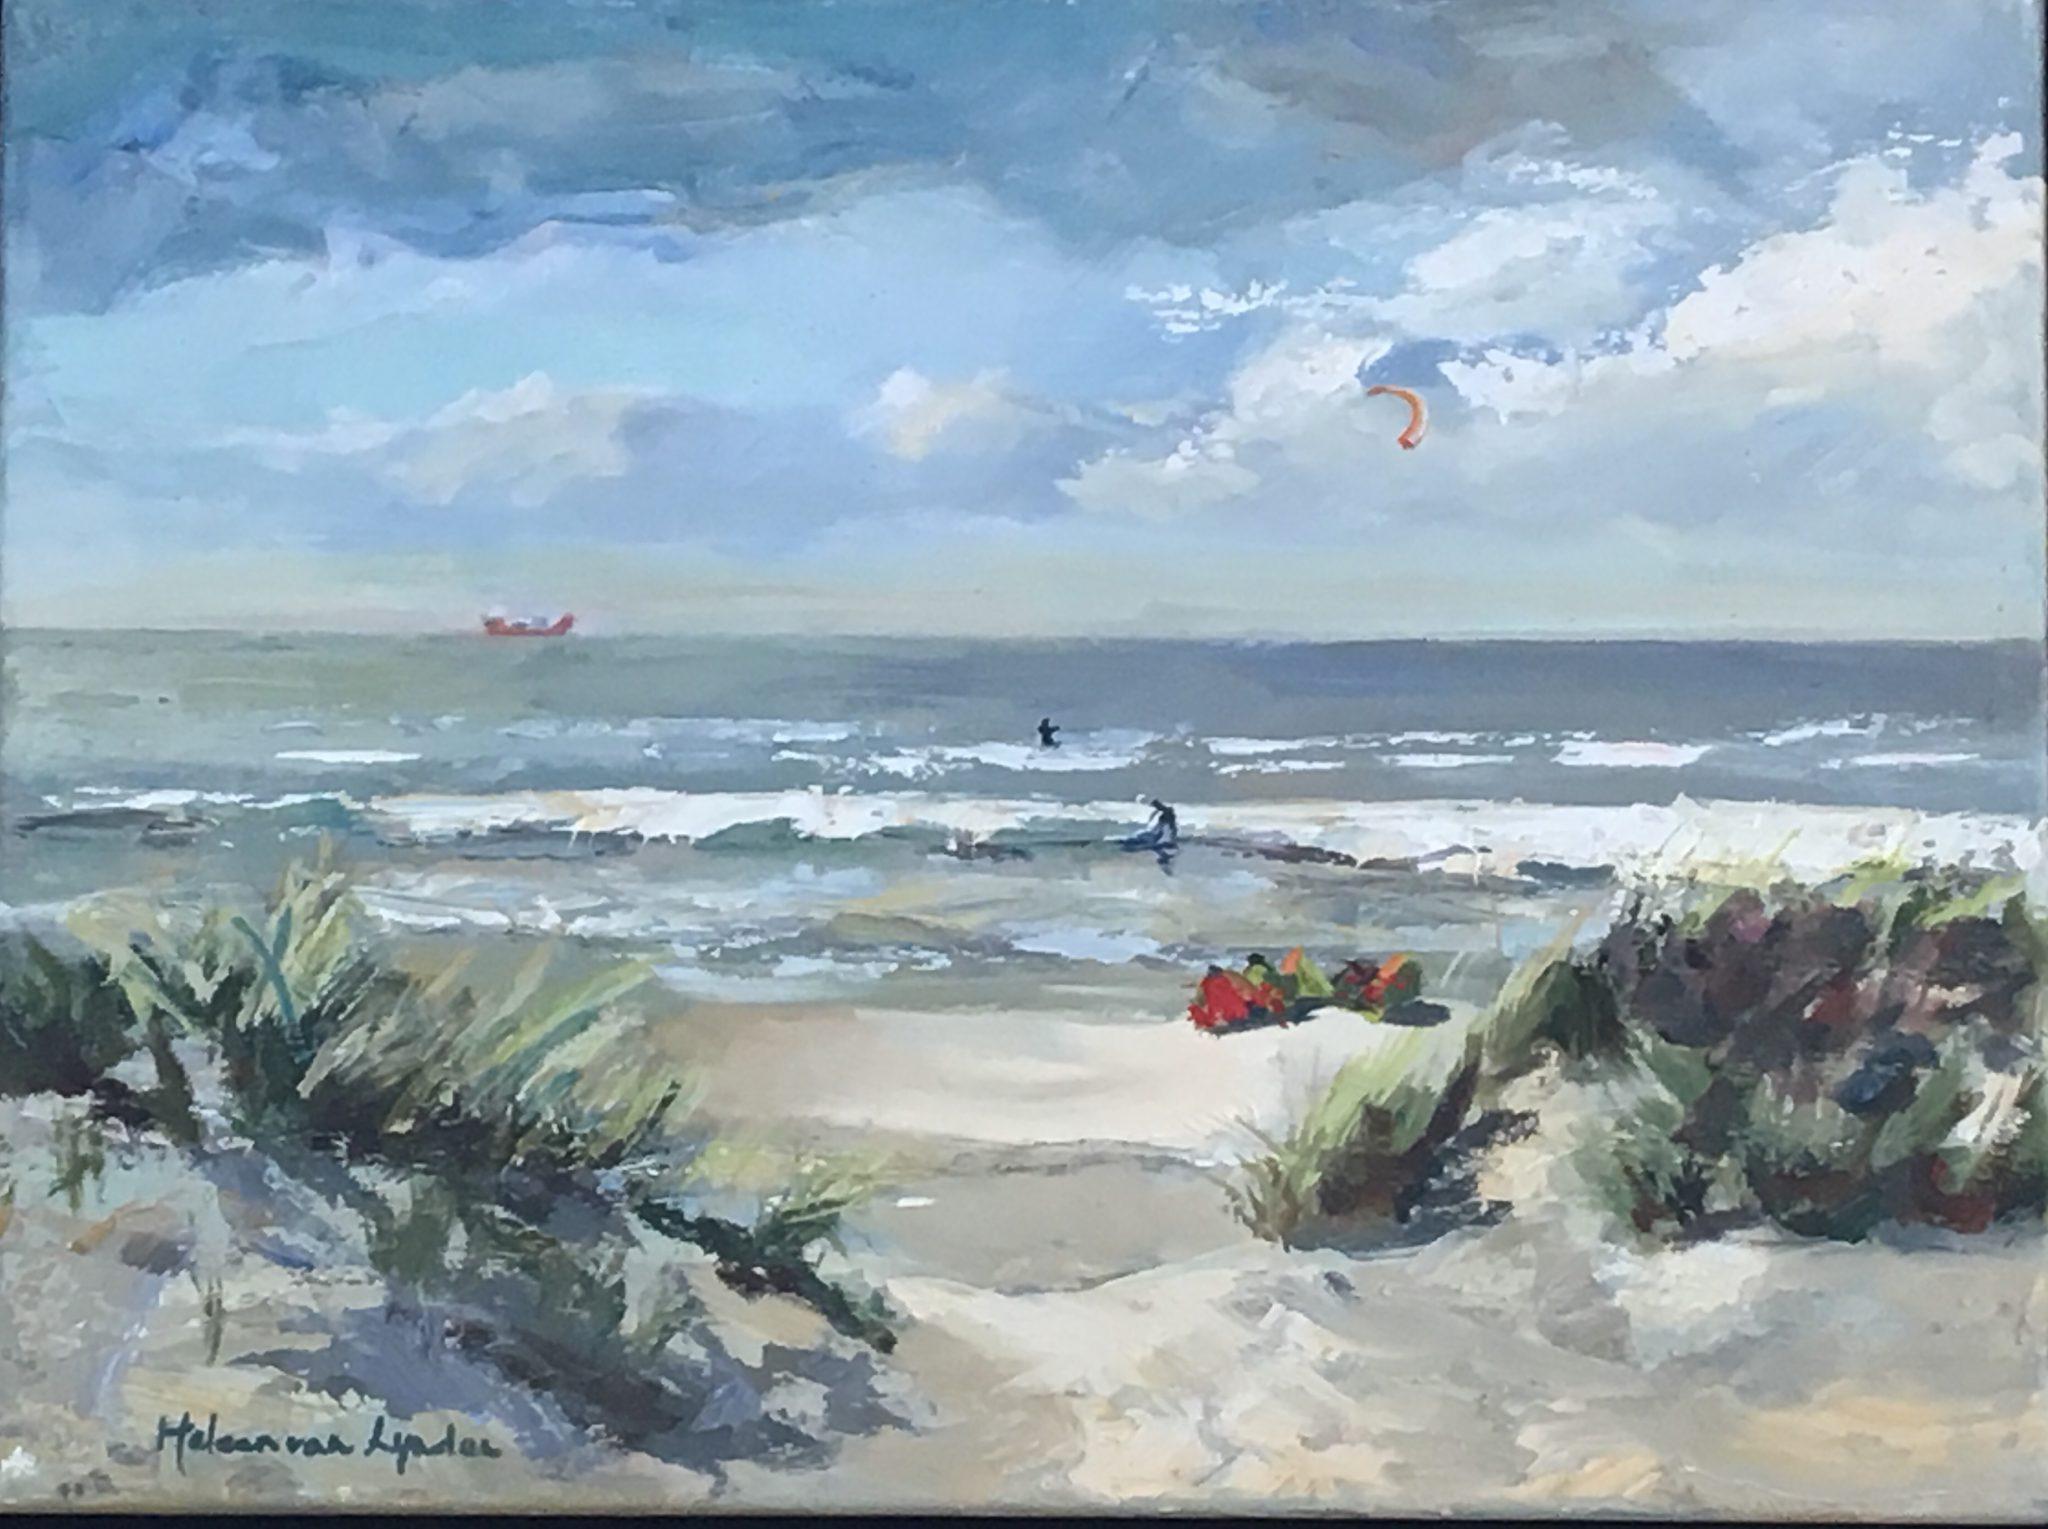 seascape- zeegezicht-zee-duinen- strandgezicht-van lynden-olieverf